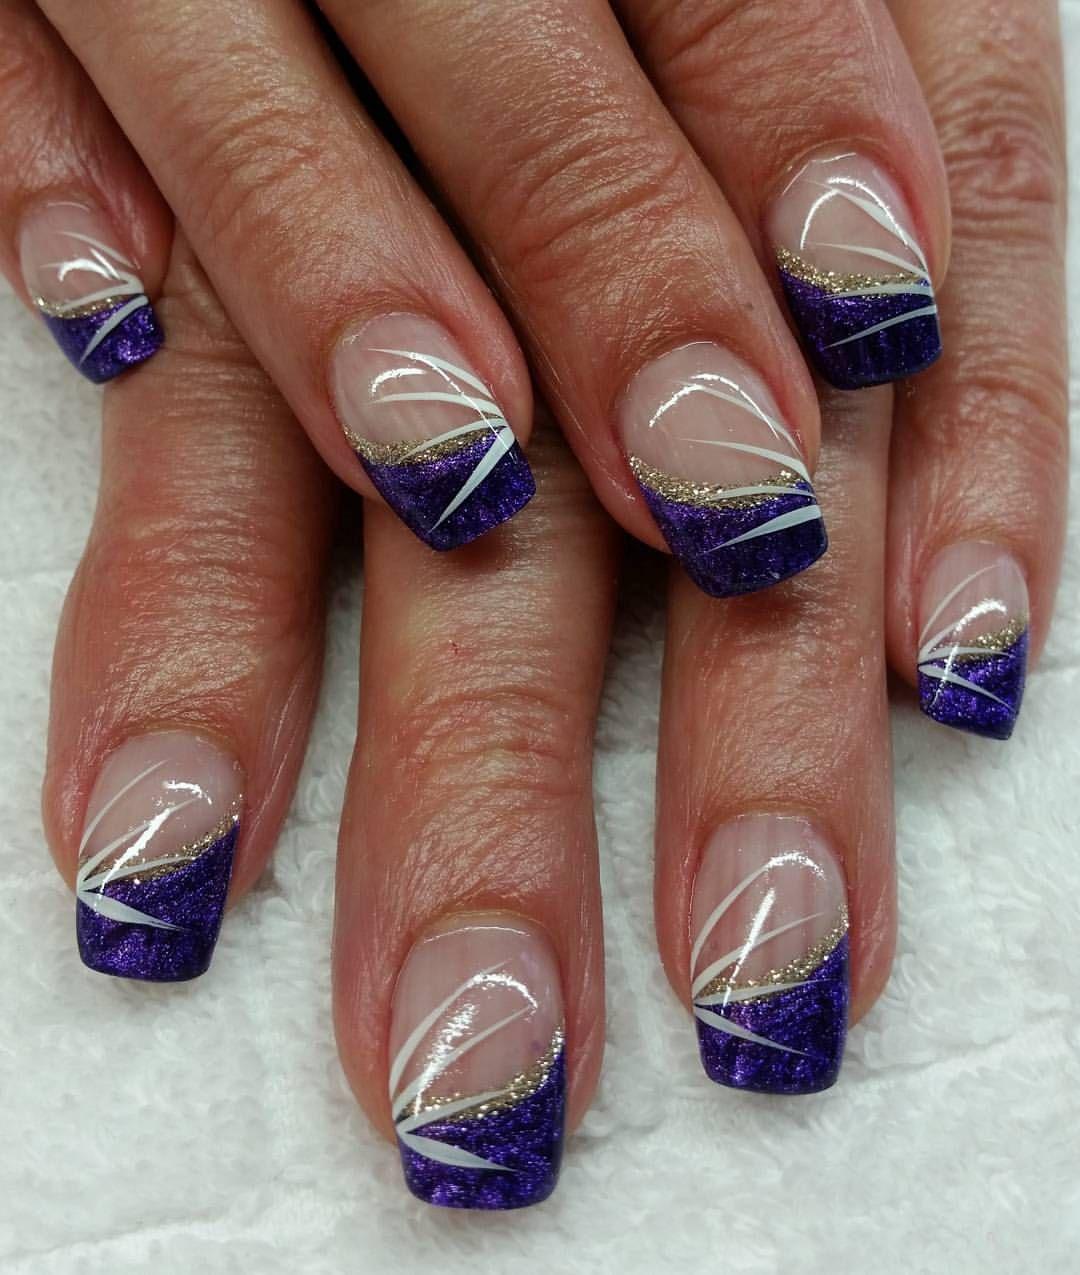 naildesigns fingern gel nails carmenirmscher haare pinterest n gel french n gel und. Black Bedroom Furniture Sets. Home Design Ideas